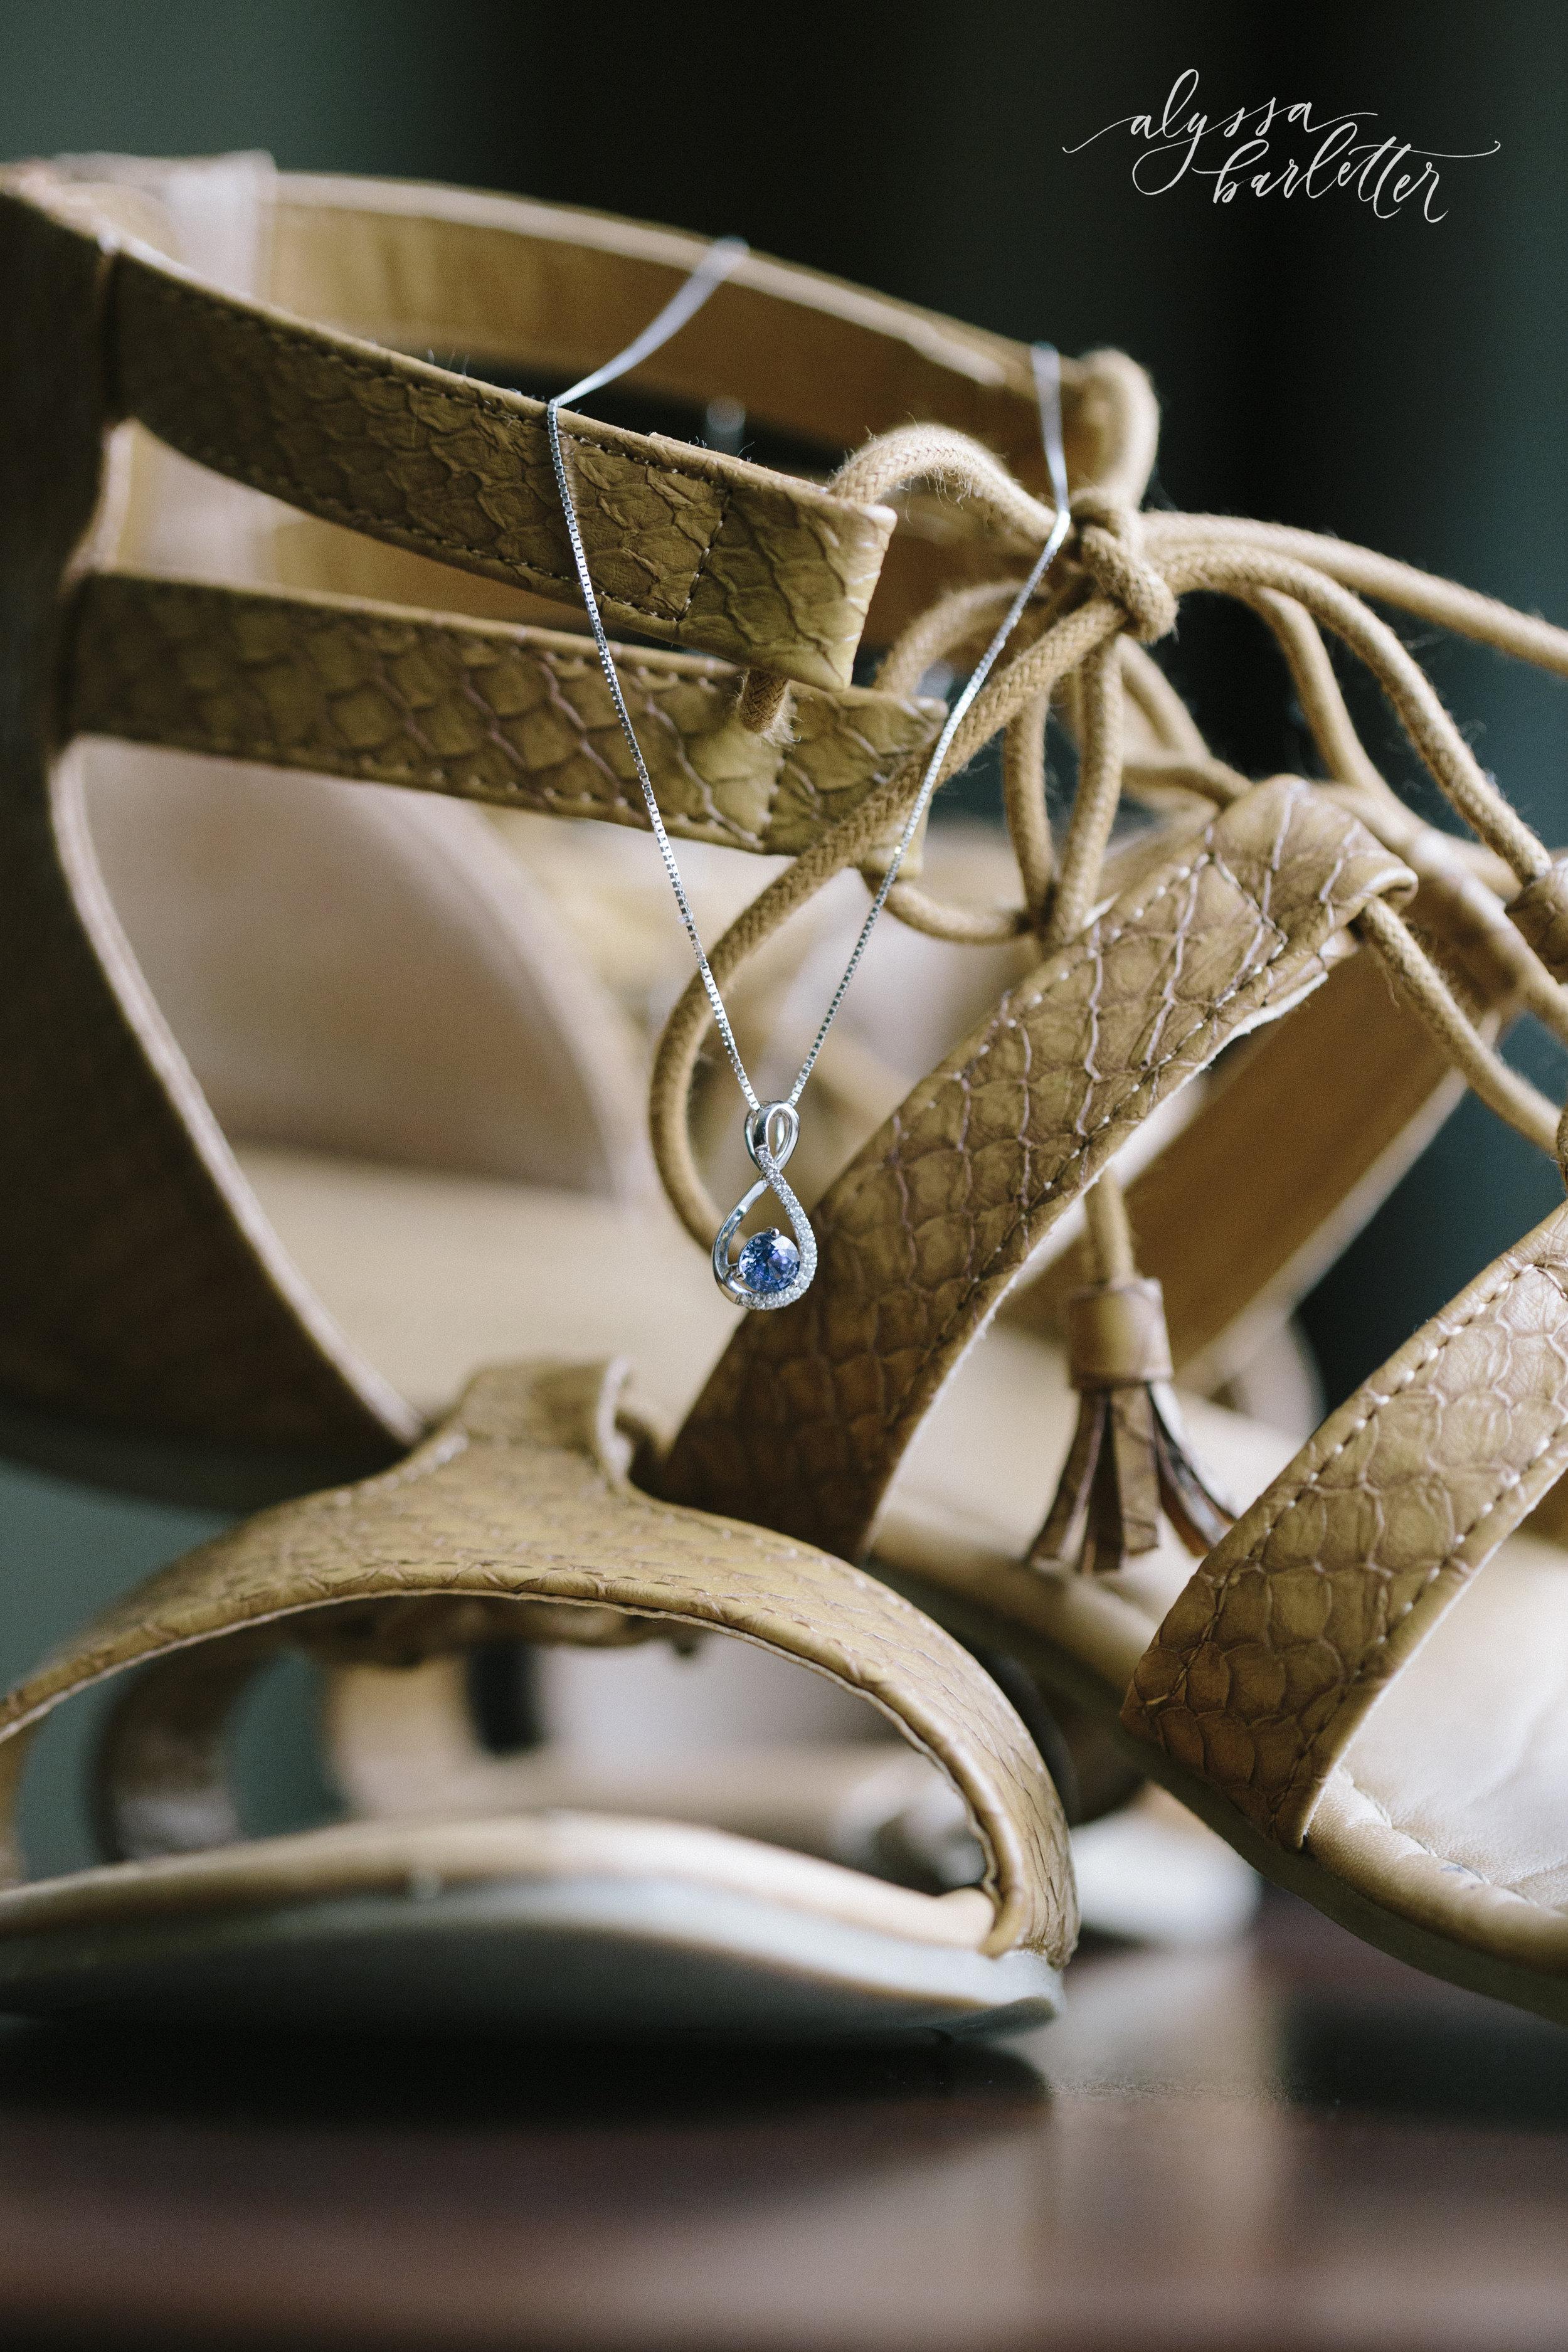 shoes-9373.jpg